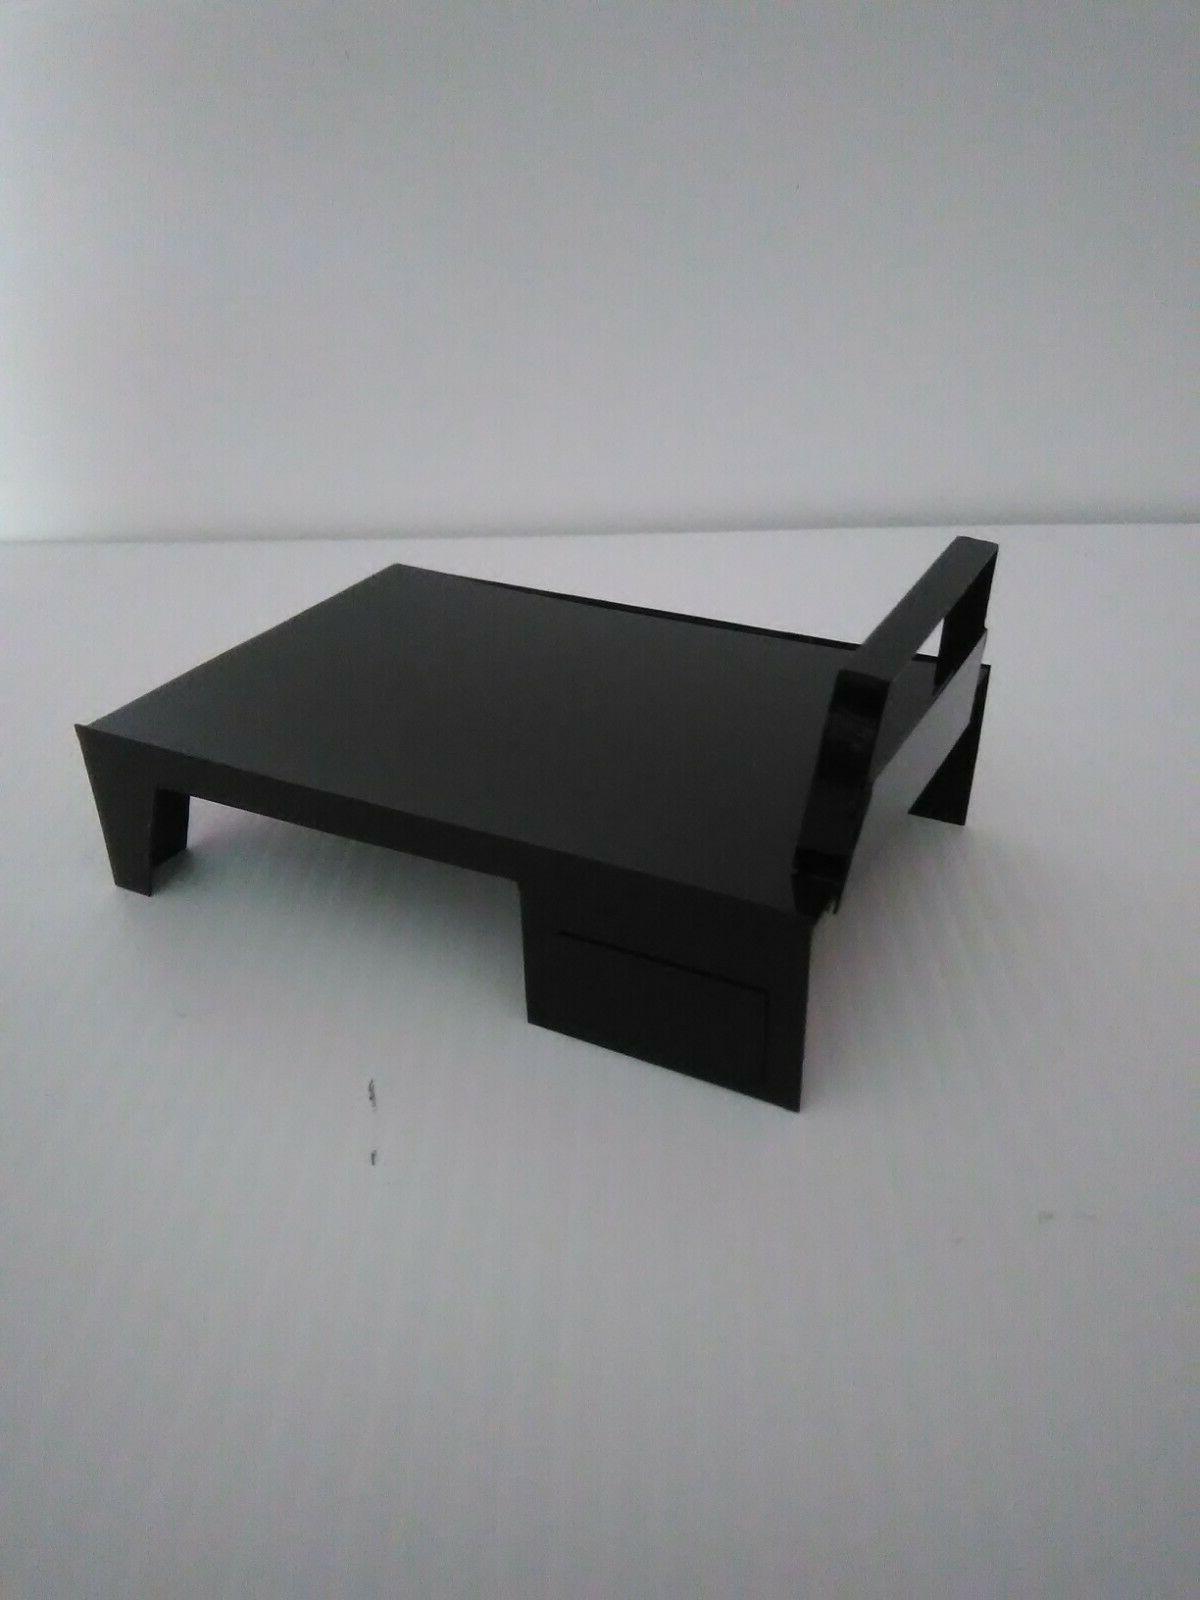 1/24 kit flatbed / workbed model